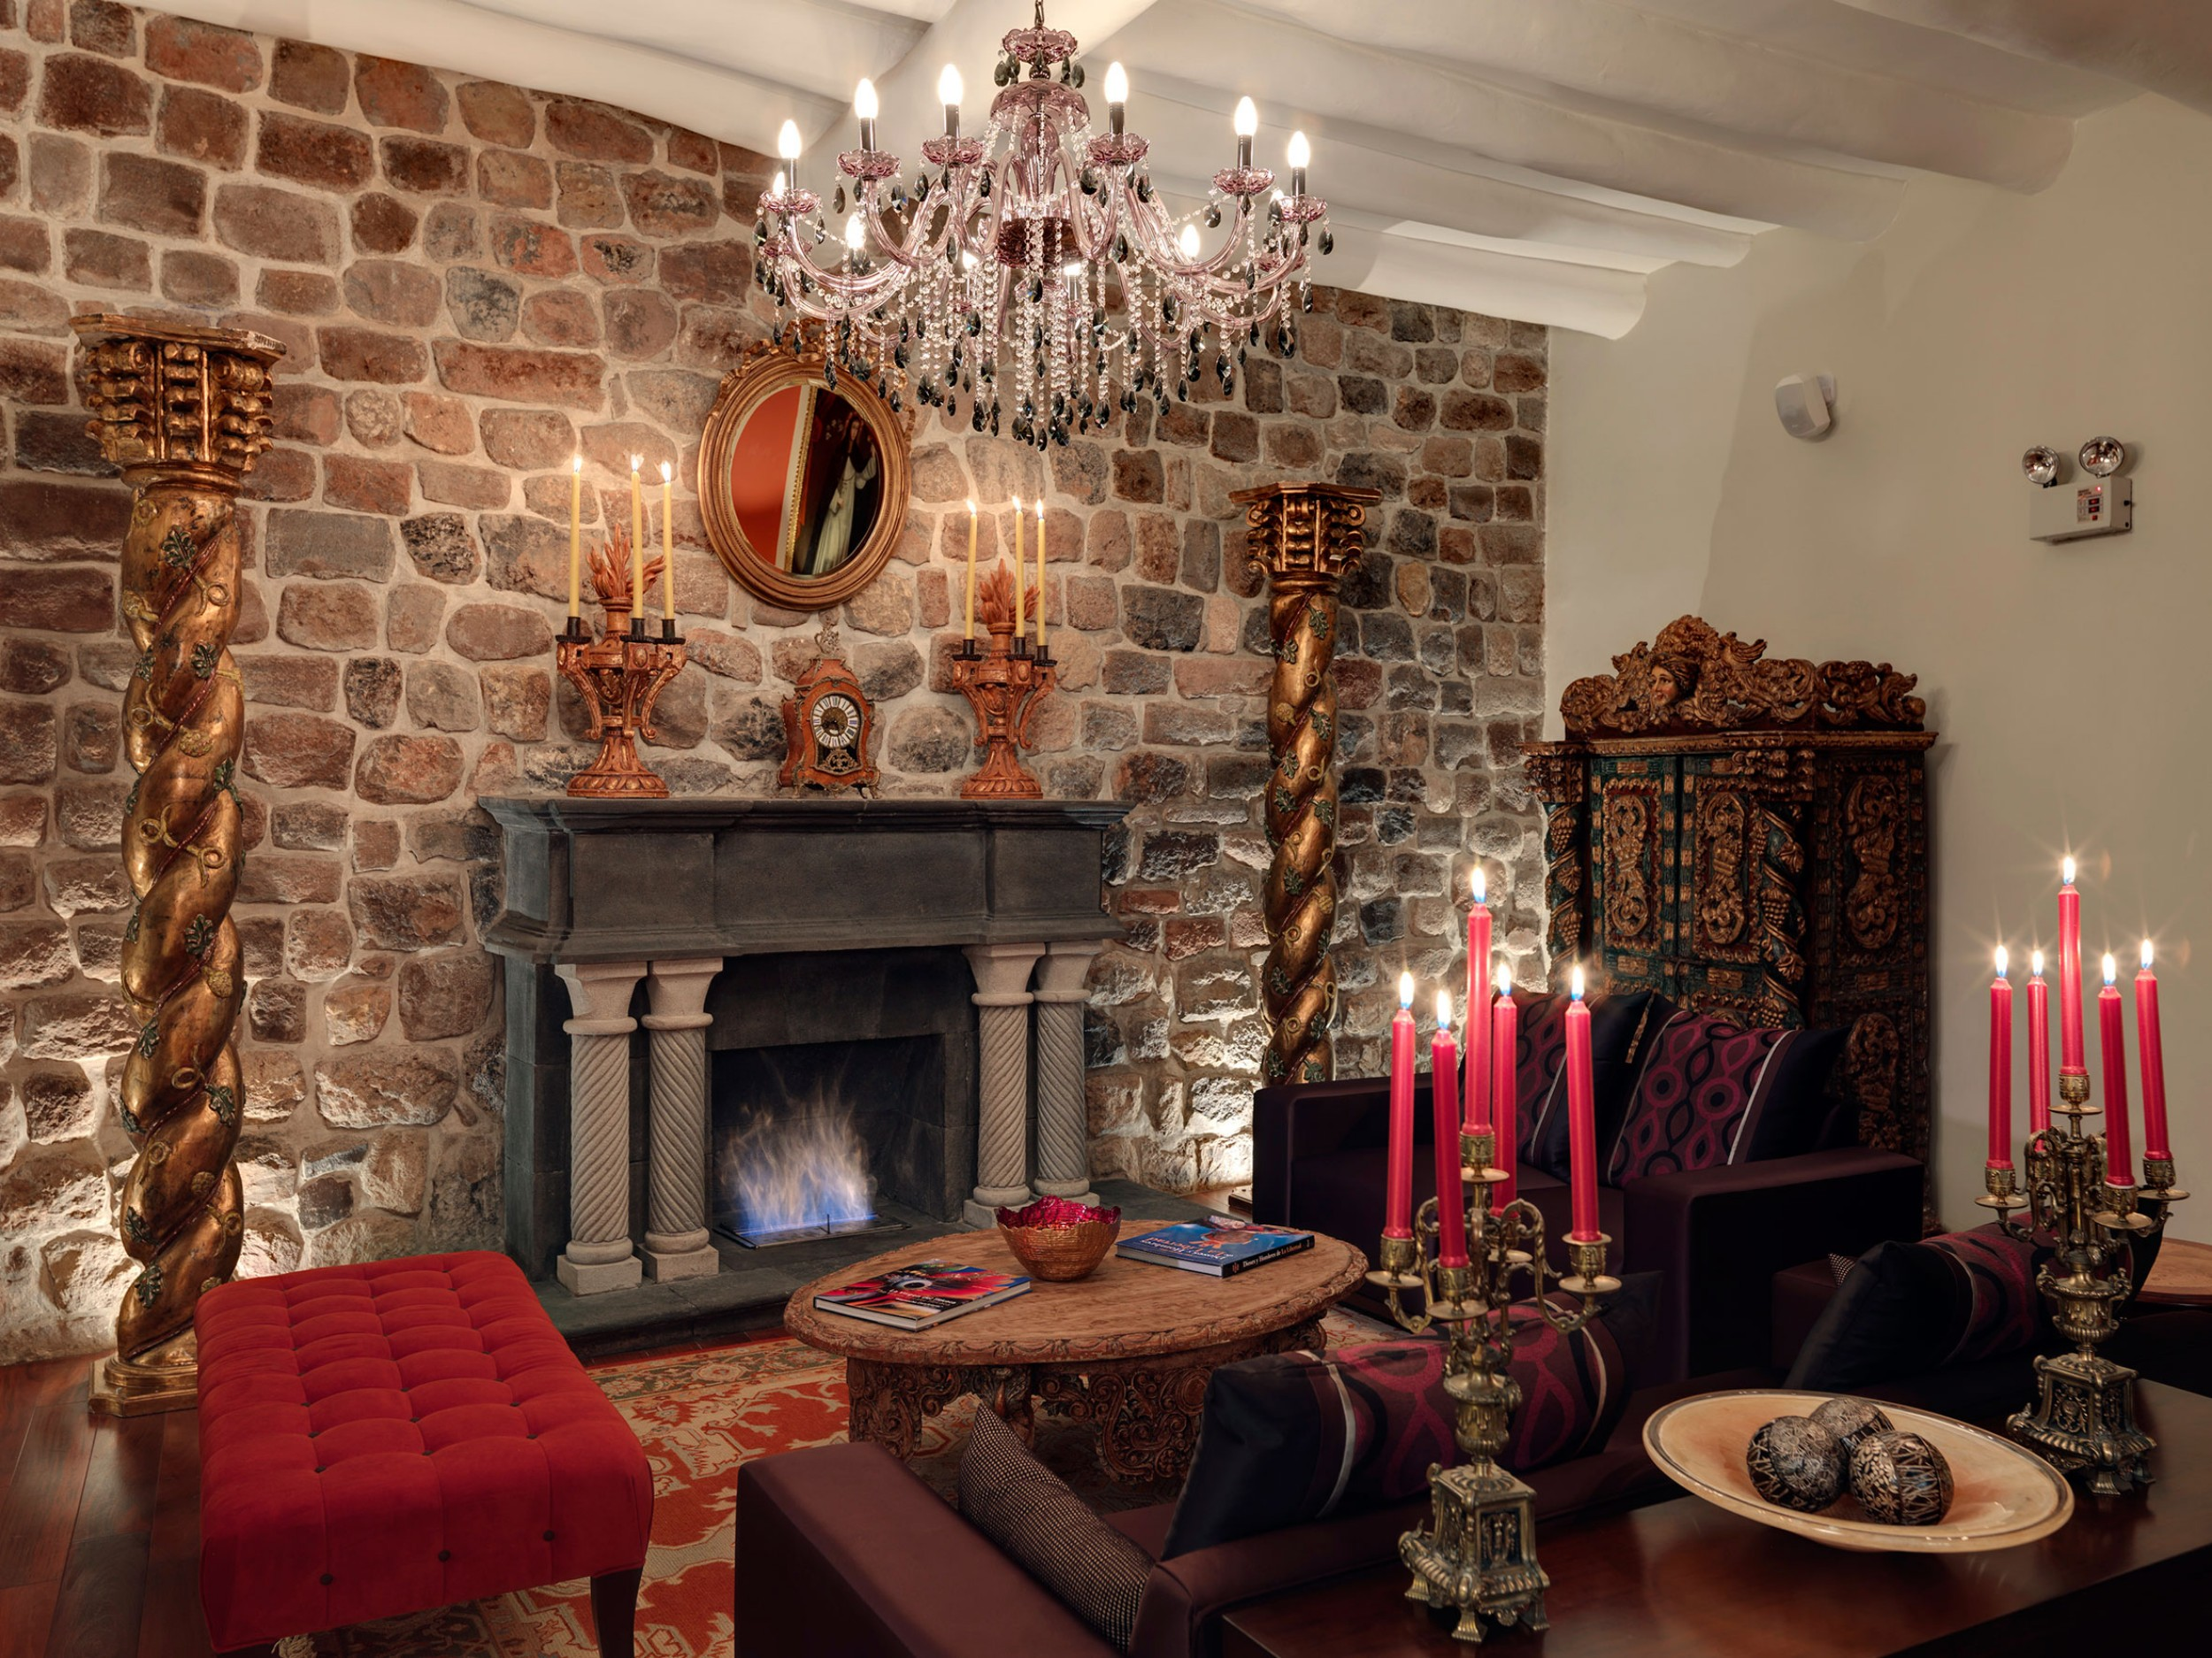 cusco-living-room-with-bawl.jpg